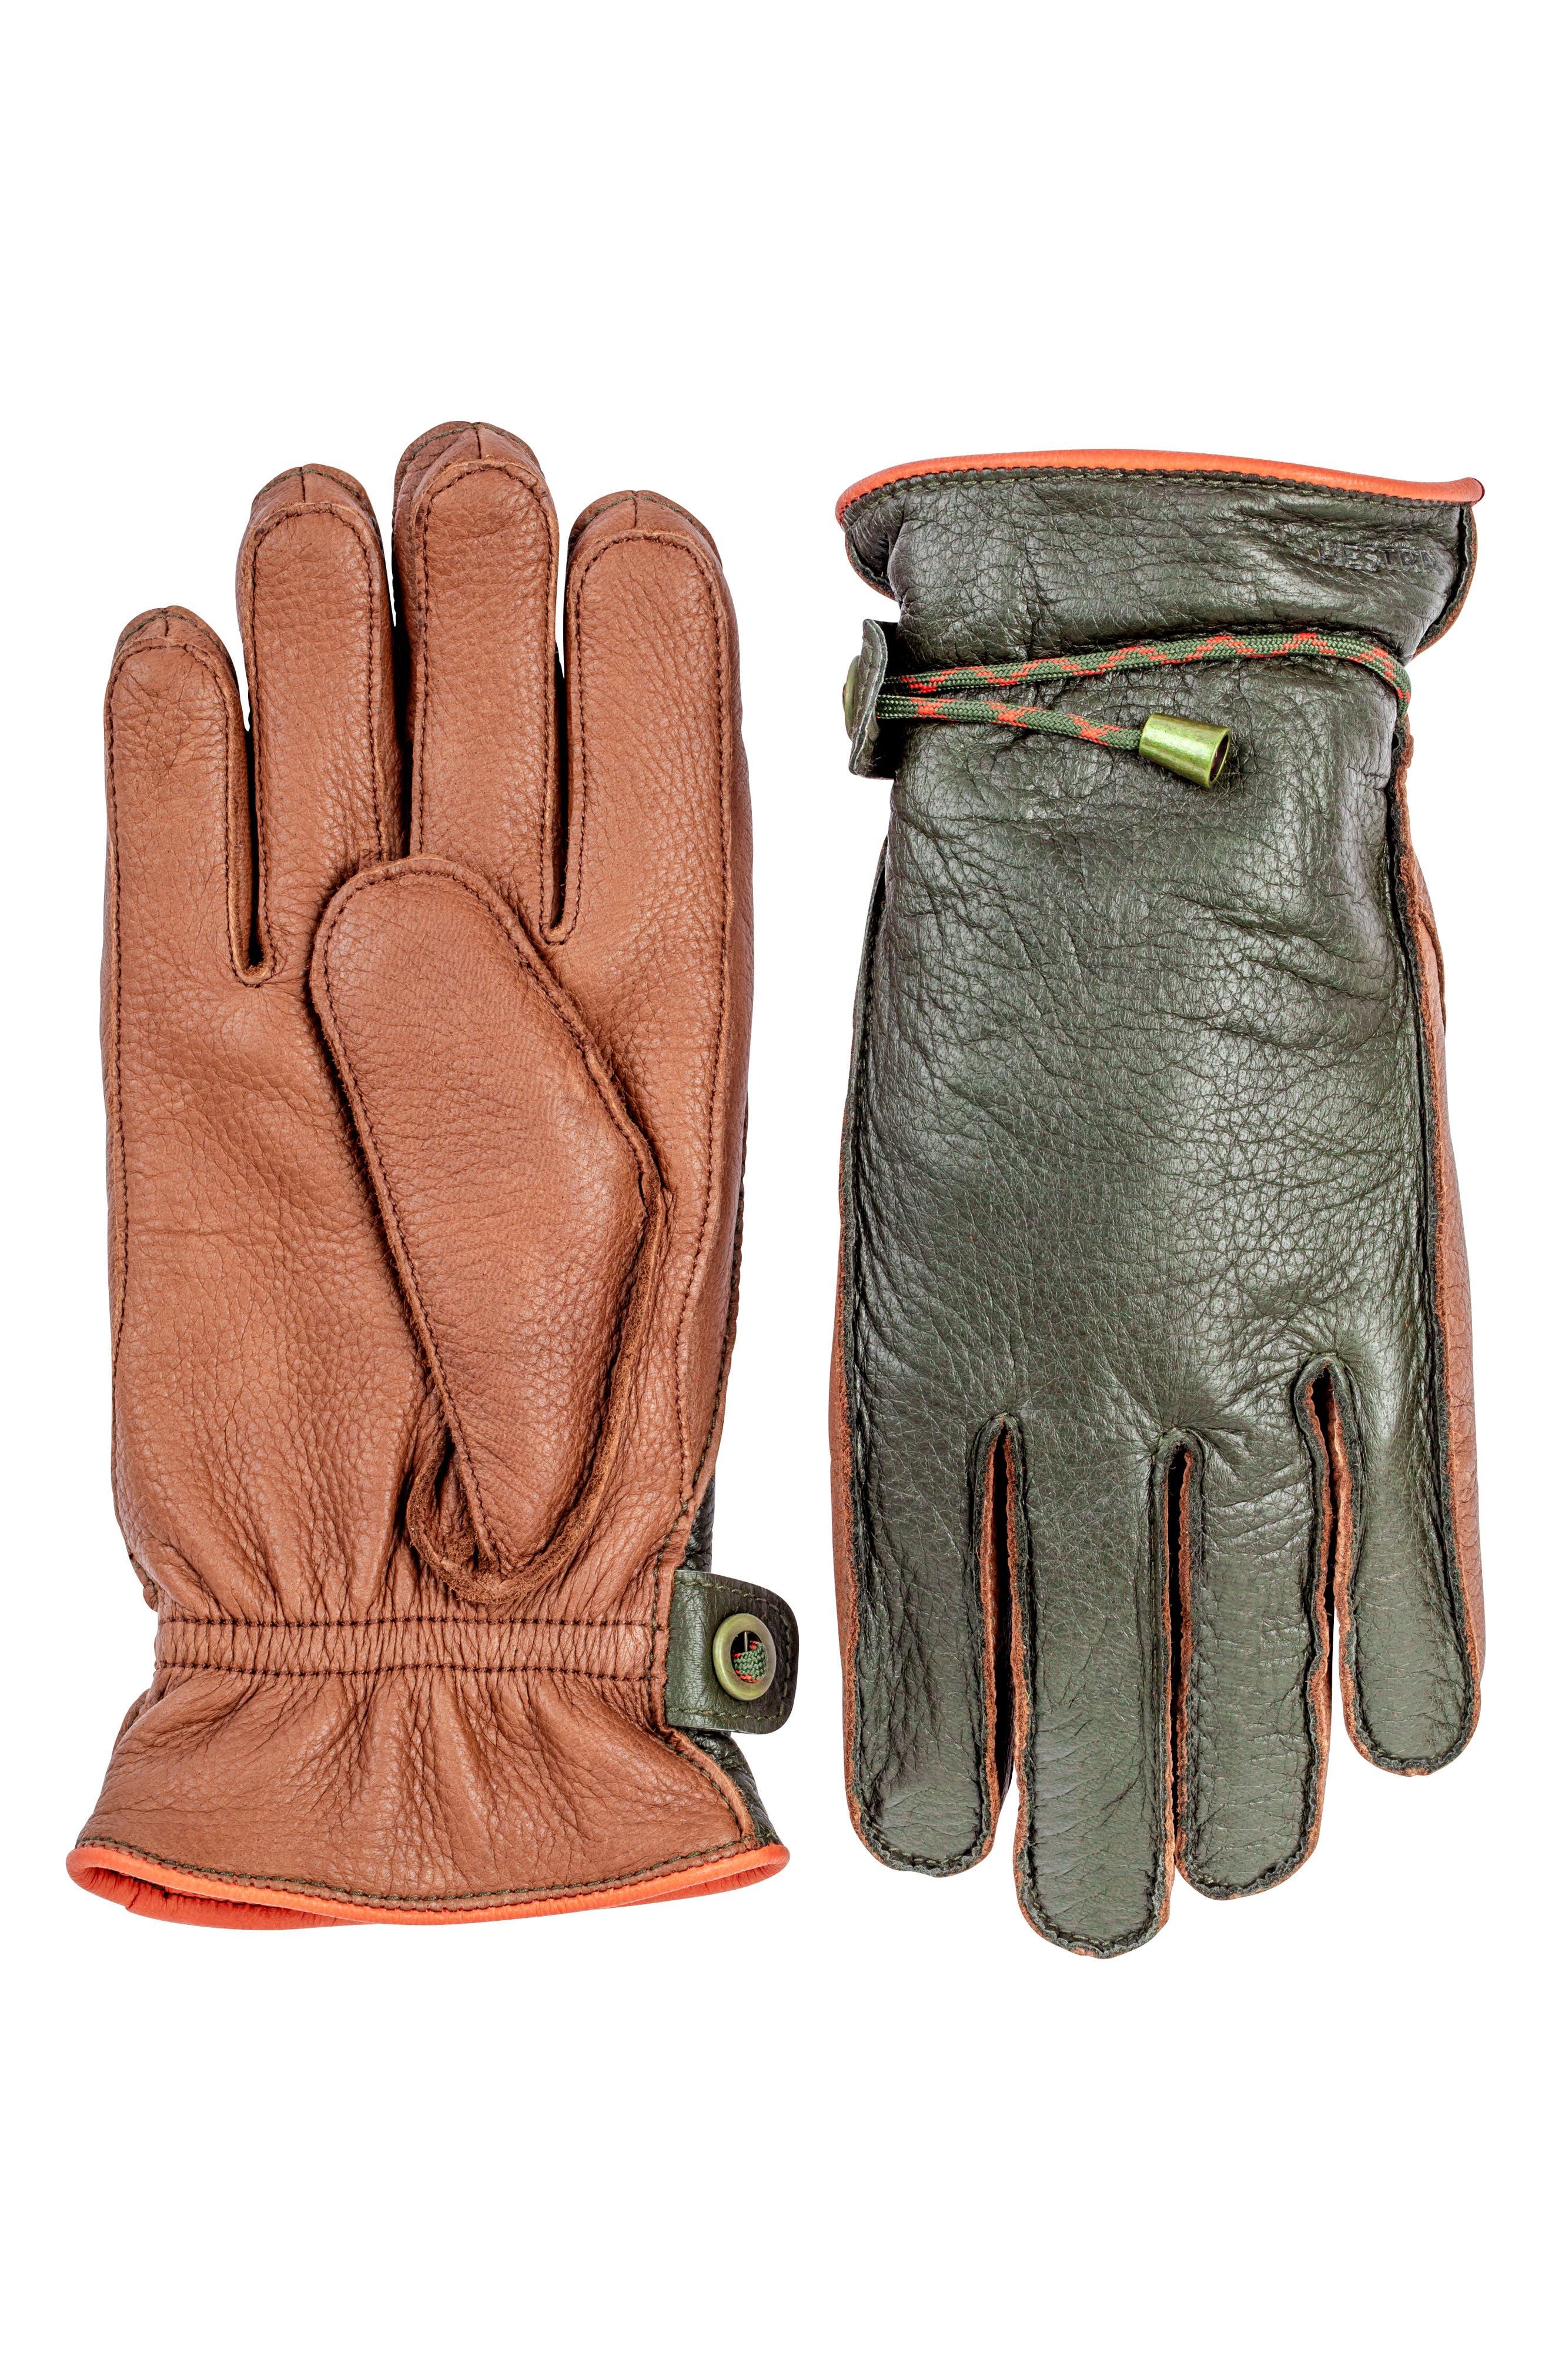 'Granvik' Leather Gloves,                             Main thumbnail 1, color,                             DARK FOREST/ CHESTNUT